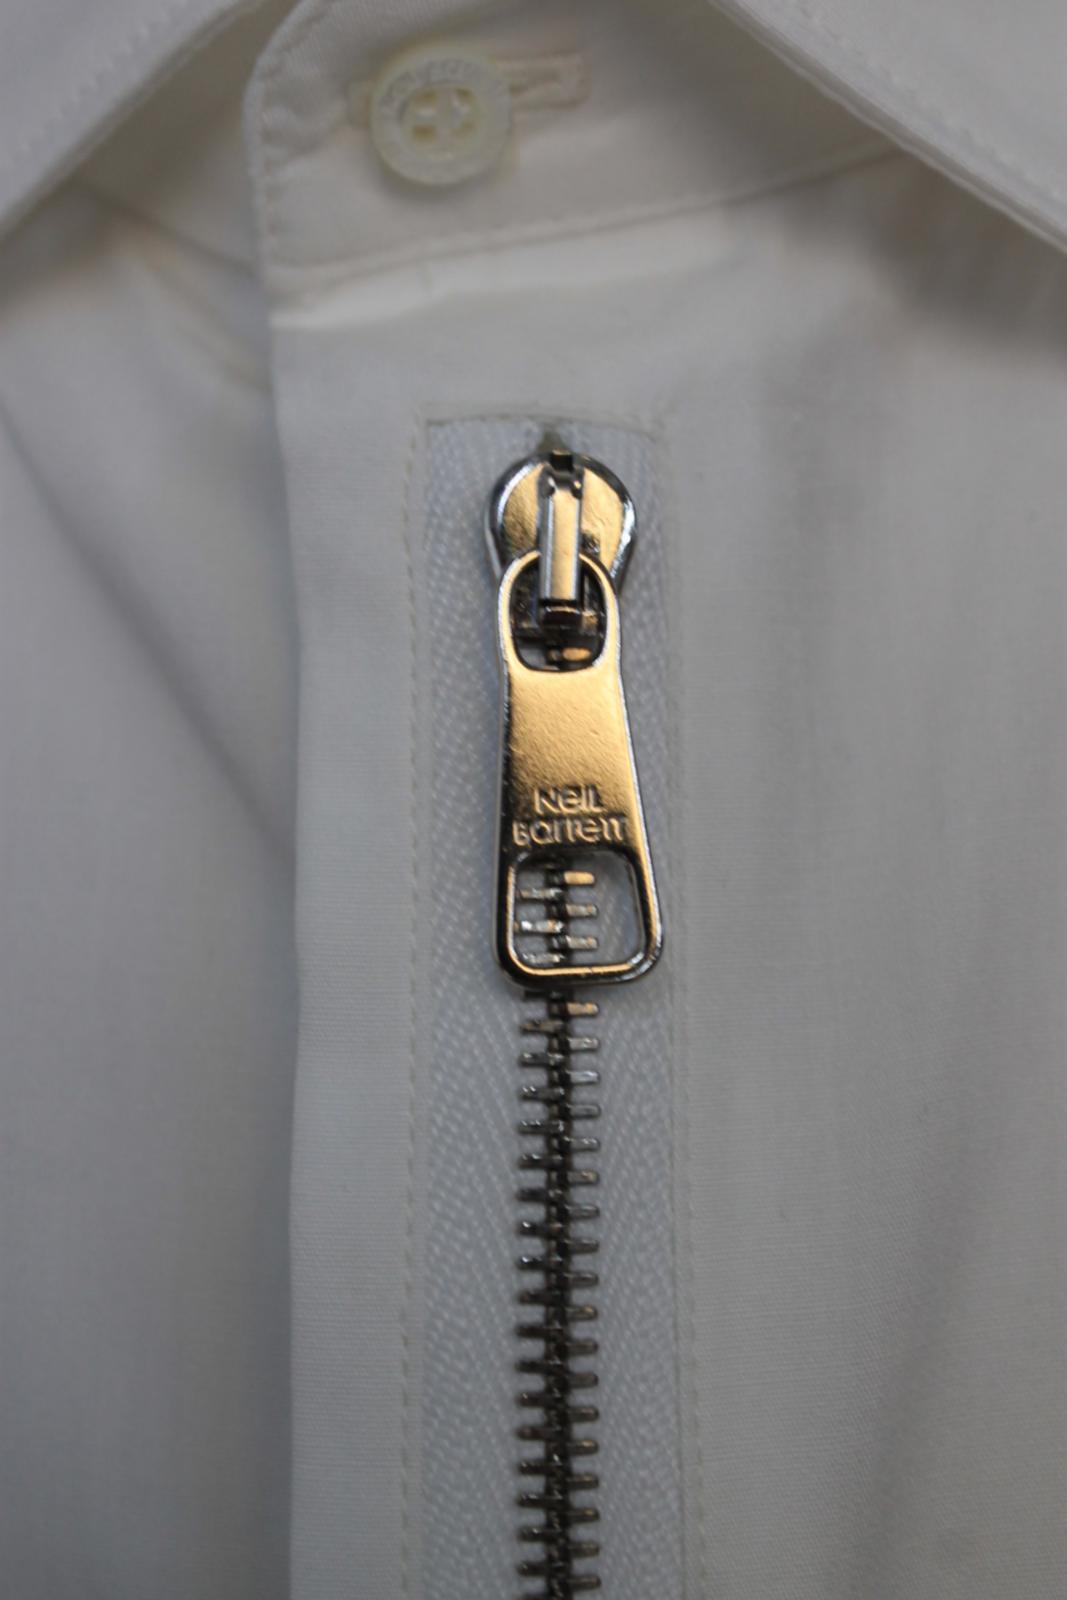 Neil-Barrett-para-hombre-calce-cenido-de-algodon-blanco-frontal-con-cremallera-con-cuello-camisa miniatura 8